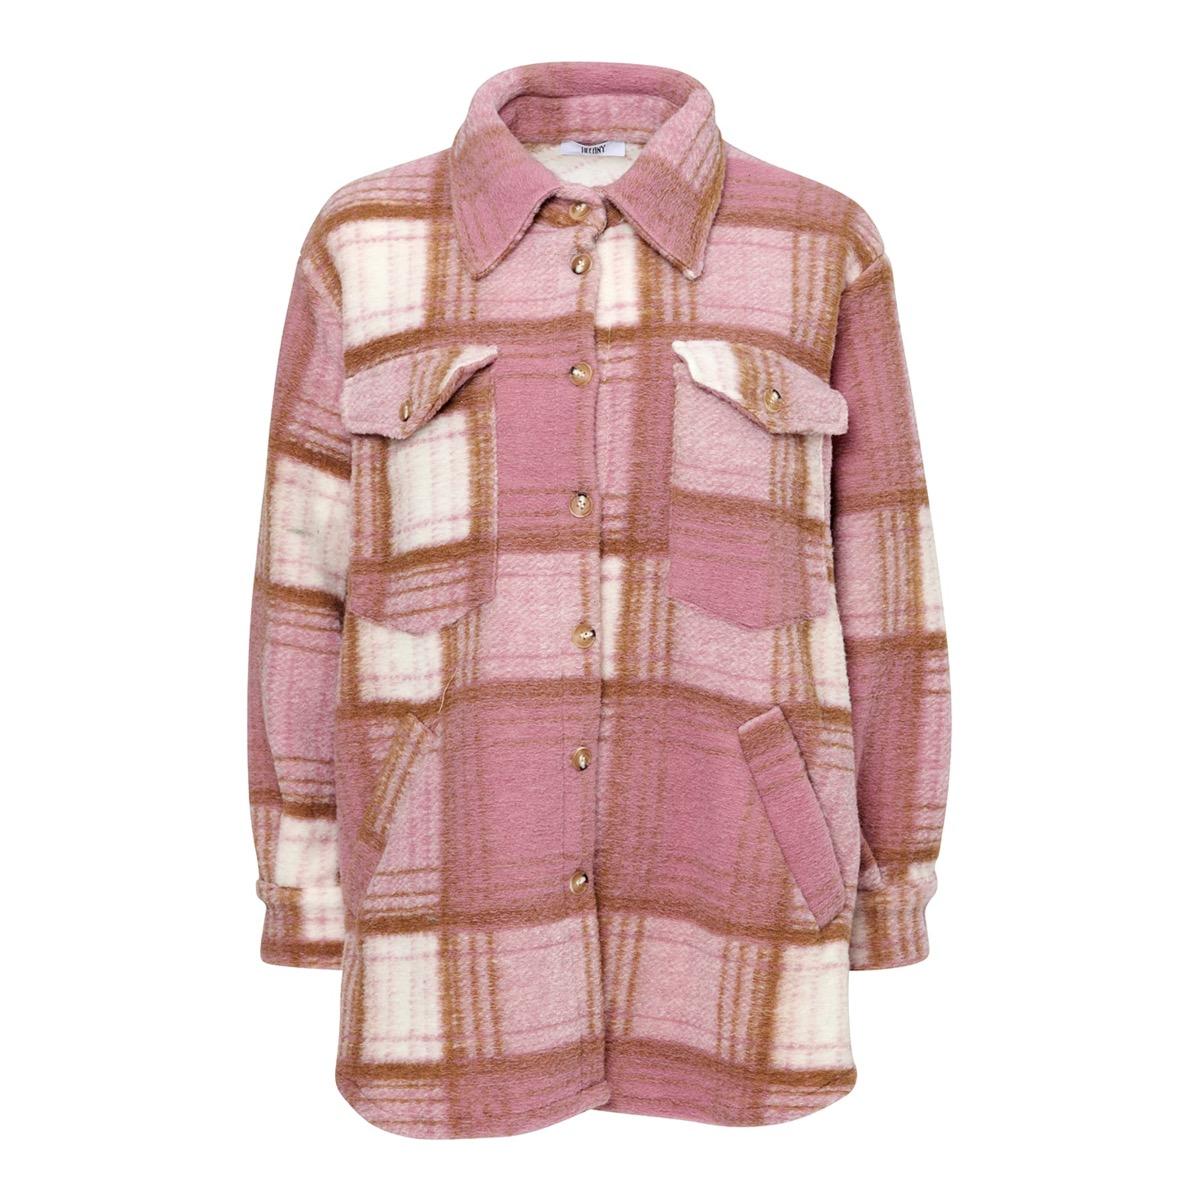 Valley Short Coat Checked, Rose/Camel, Tiffany